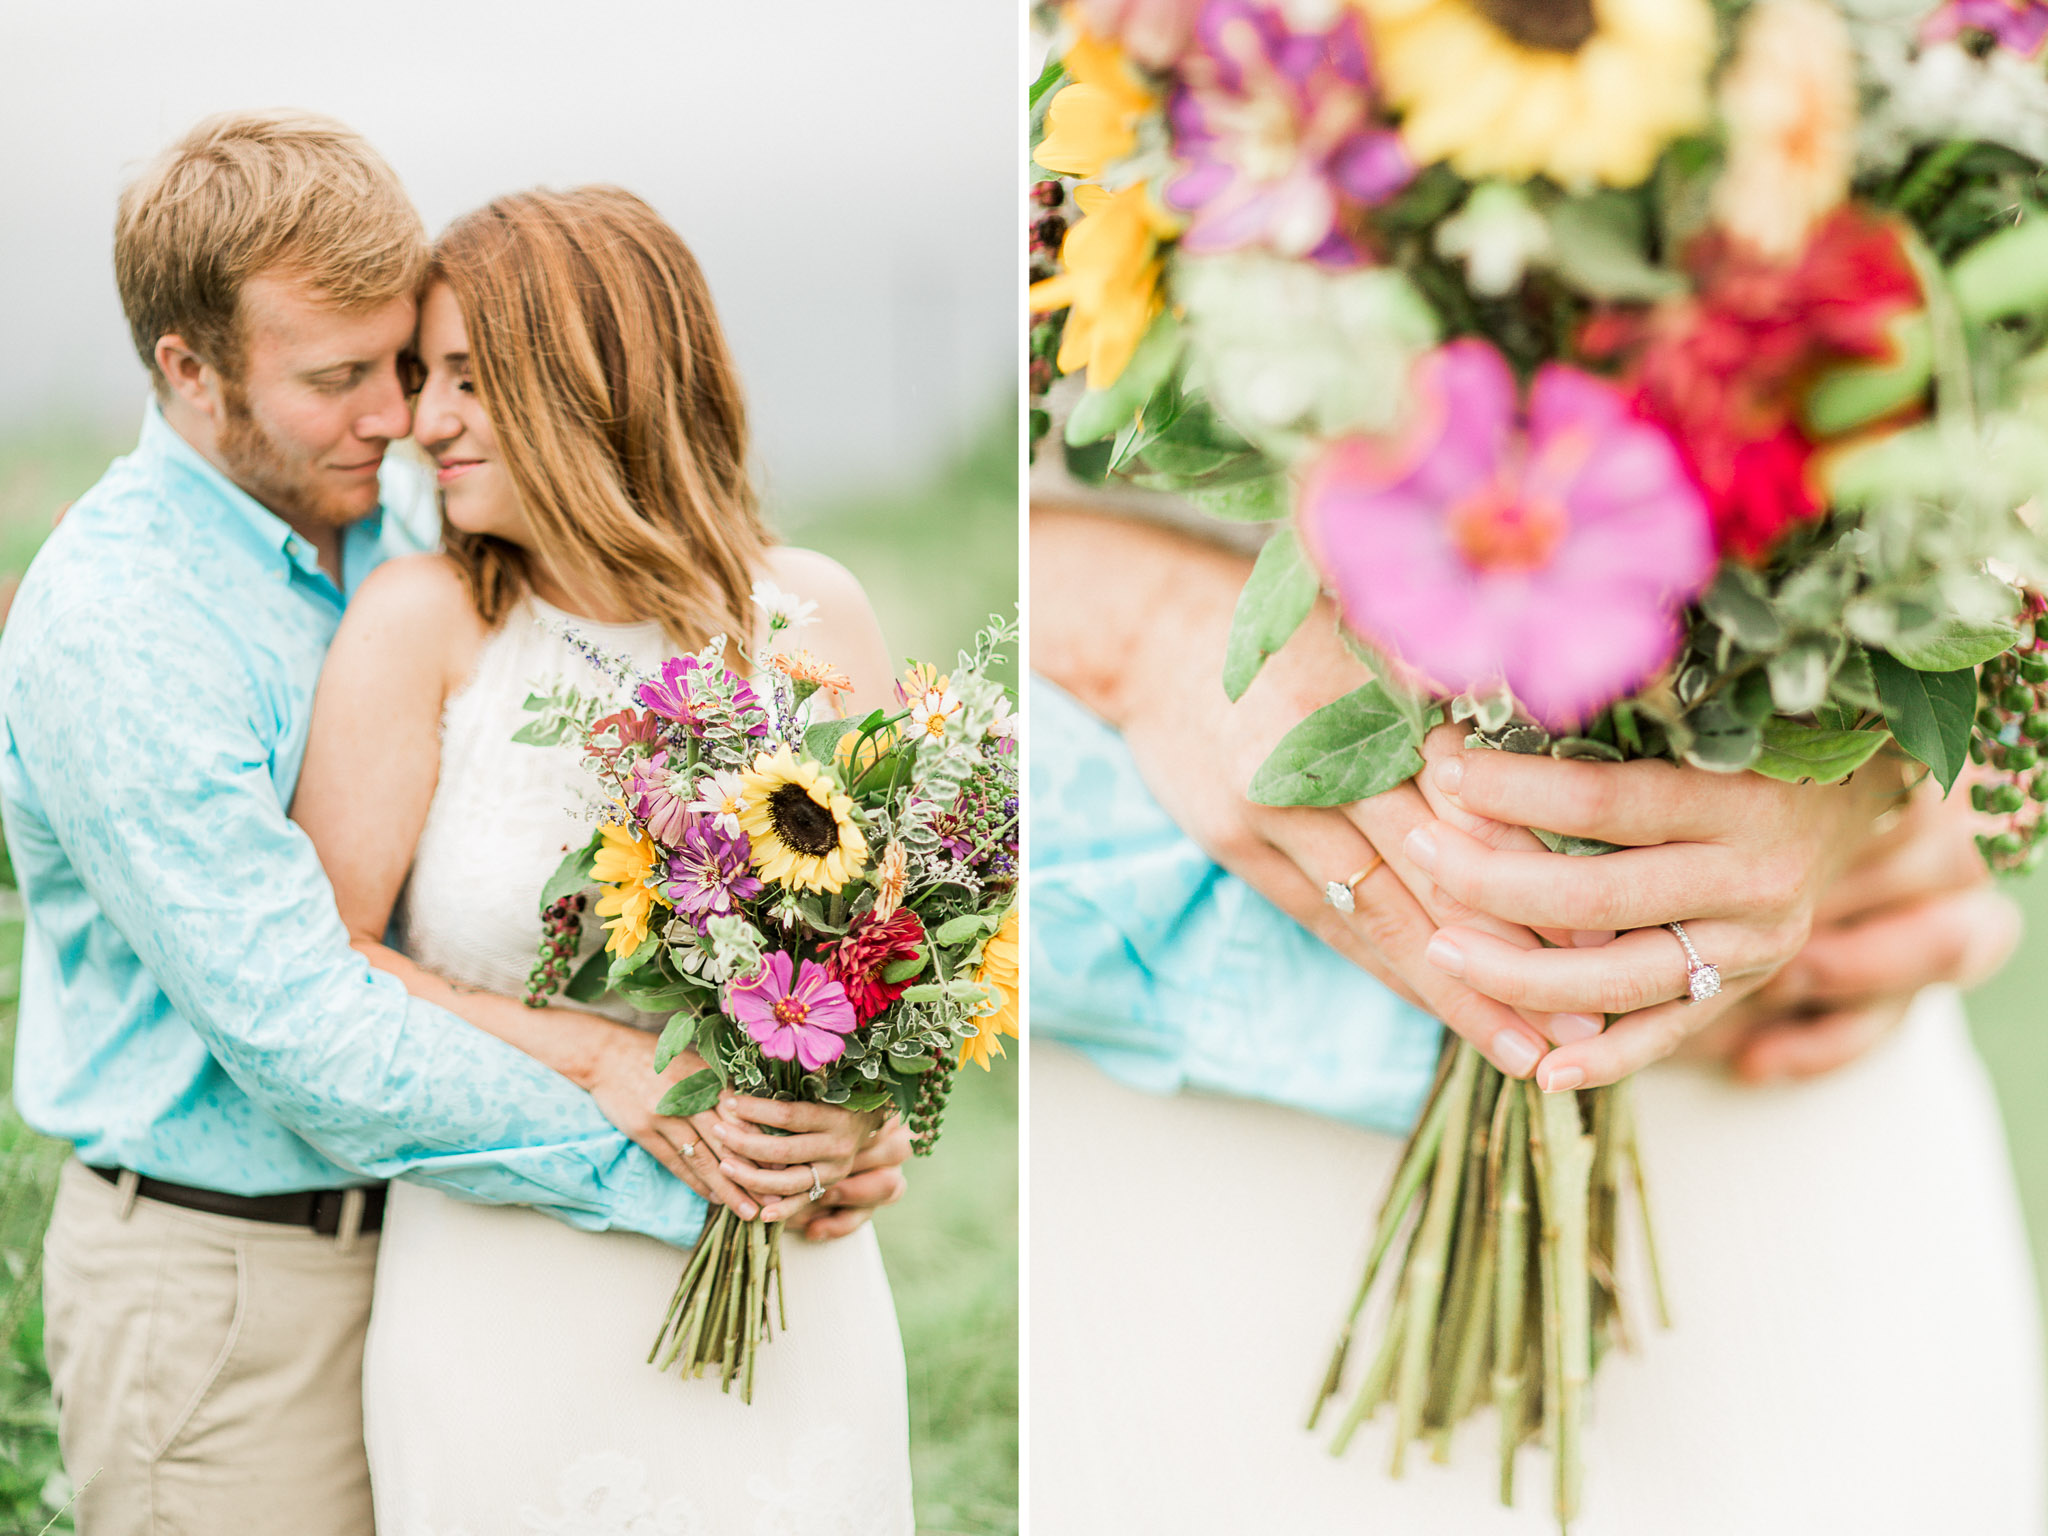 Burkburnett, TX Engagement Photos - Fine Art Photography